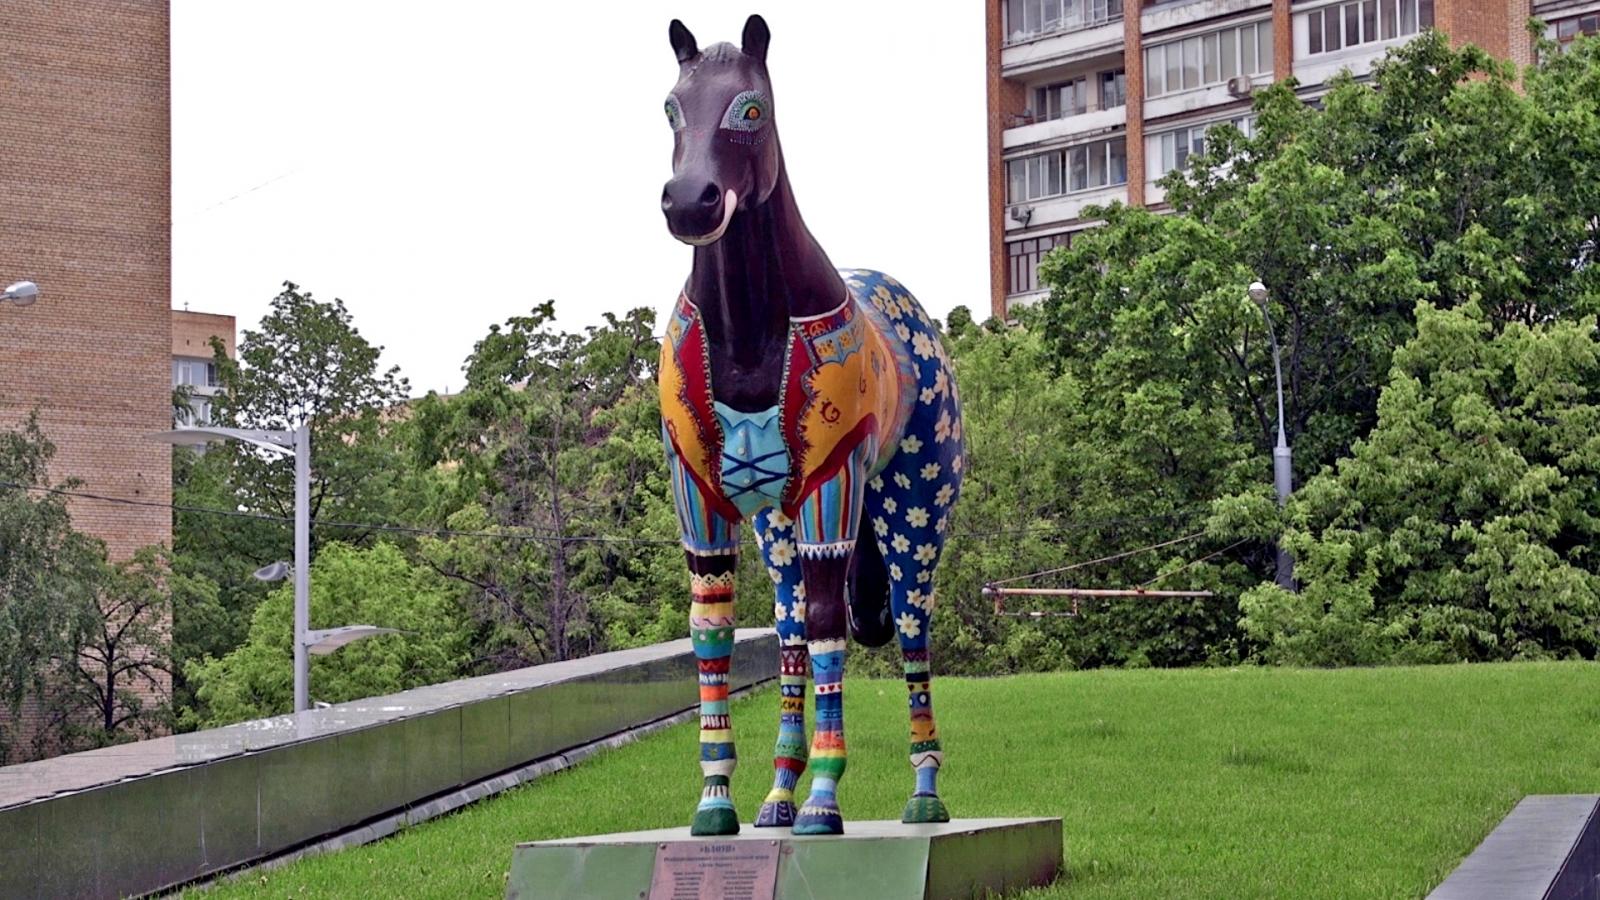 A horse sculpture outside Yandex headquarters